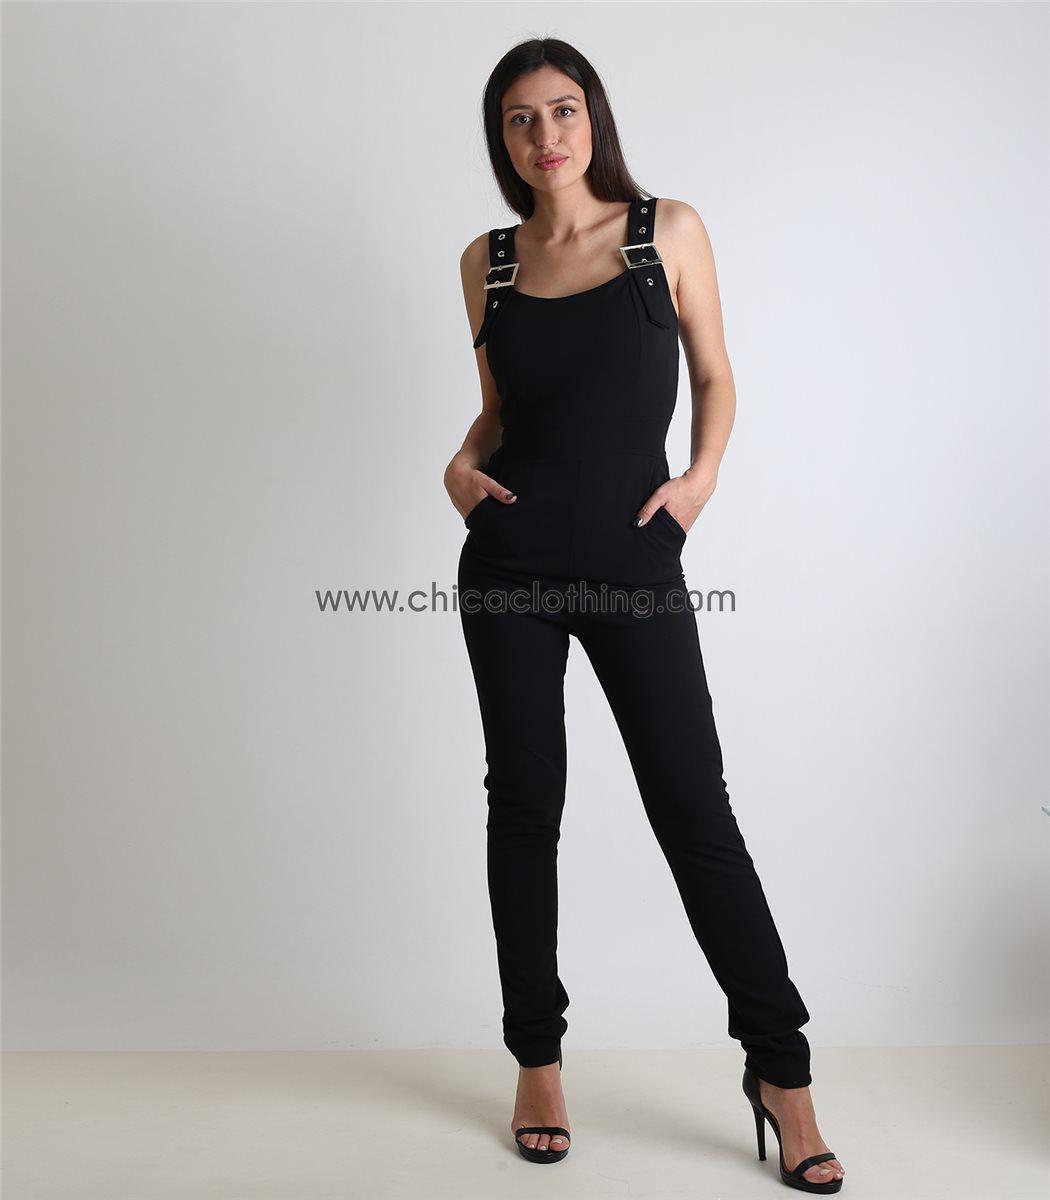 ac63e02fec78 Γυναικεία ολόσωμη φόρμα με ρυθμιζόμενα λουράκια και επένδυση (Μαύρο)